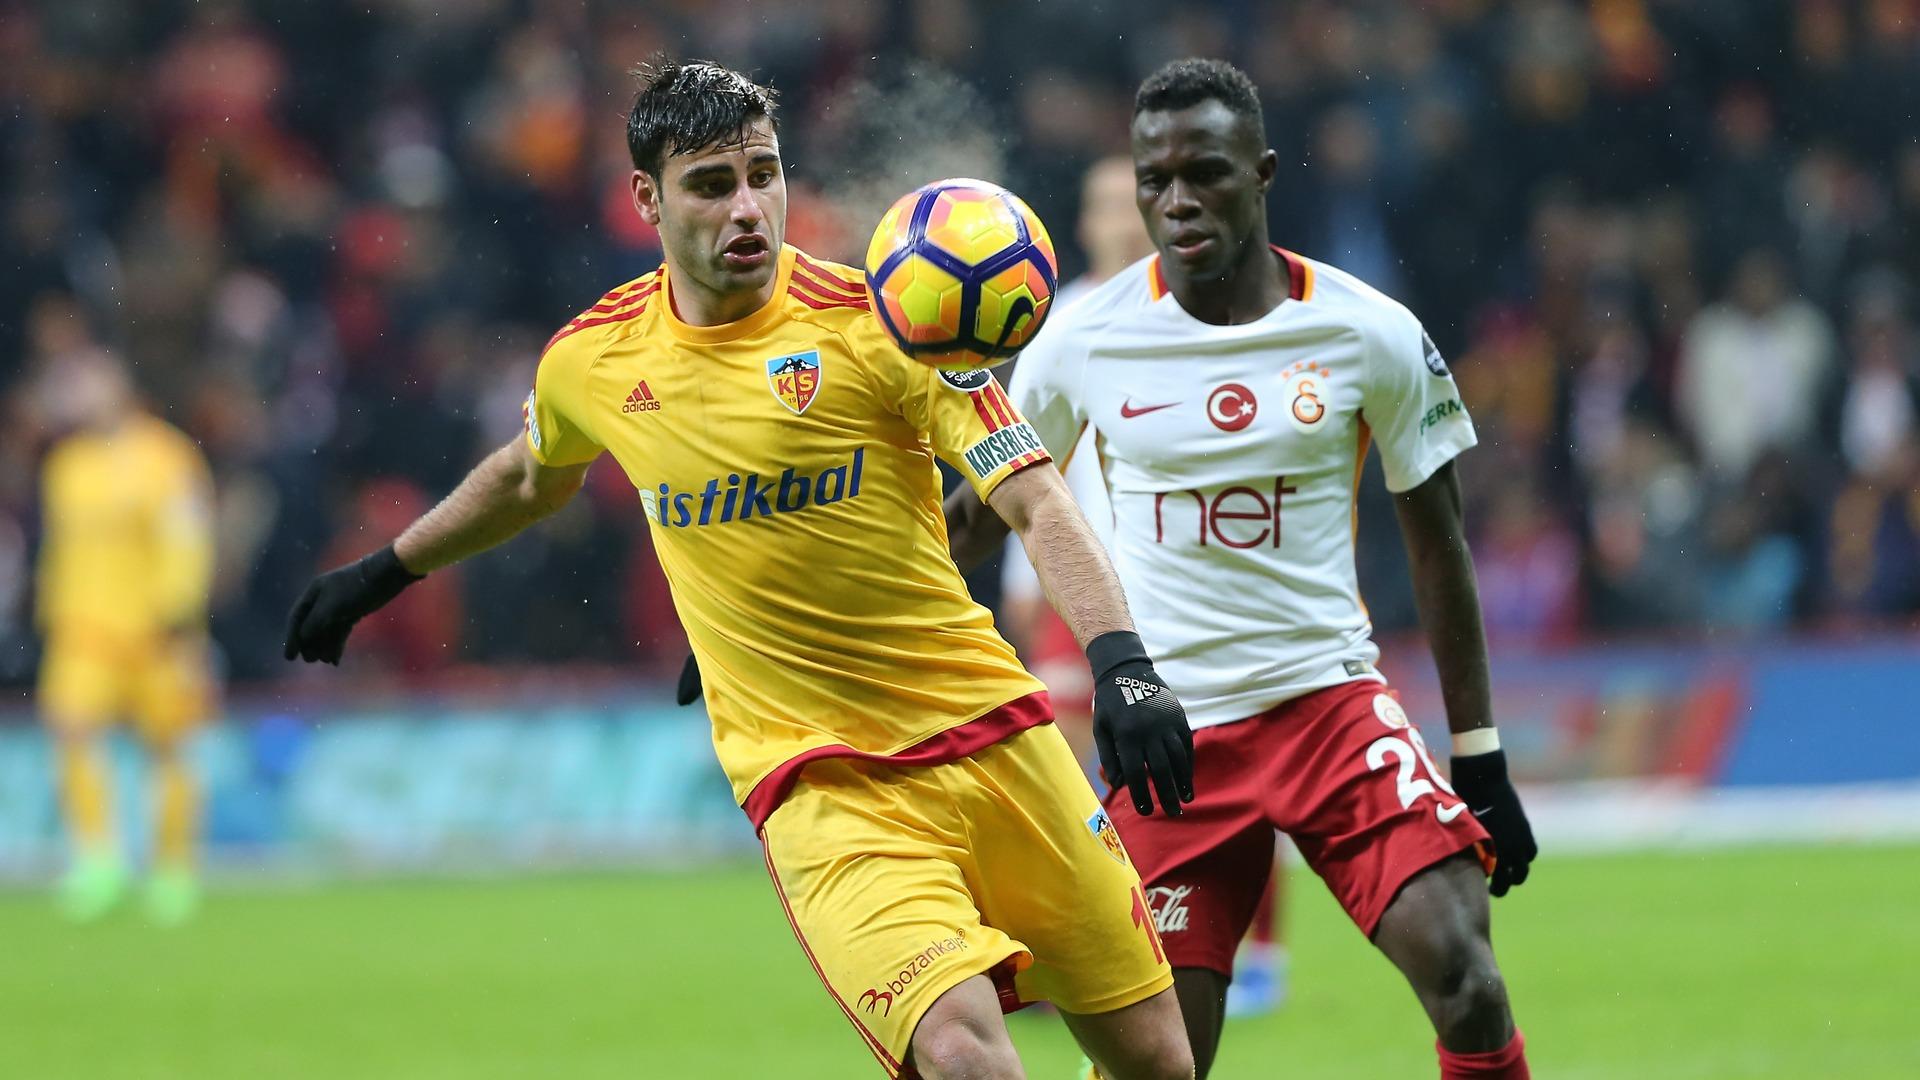 Deniz Turuc Bruma Galatasaray Kayserispor STSL